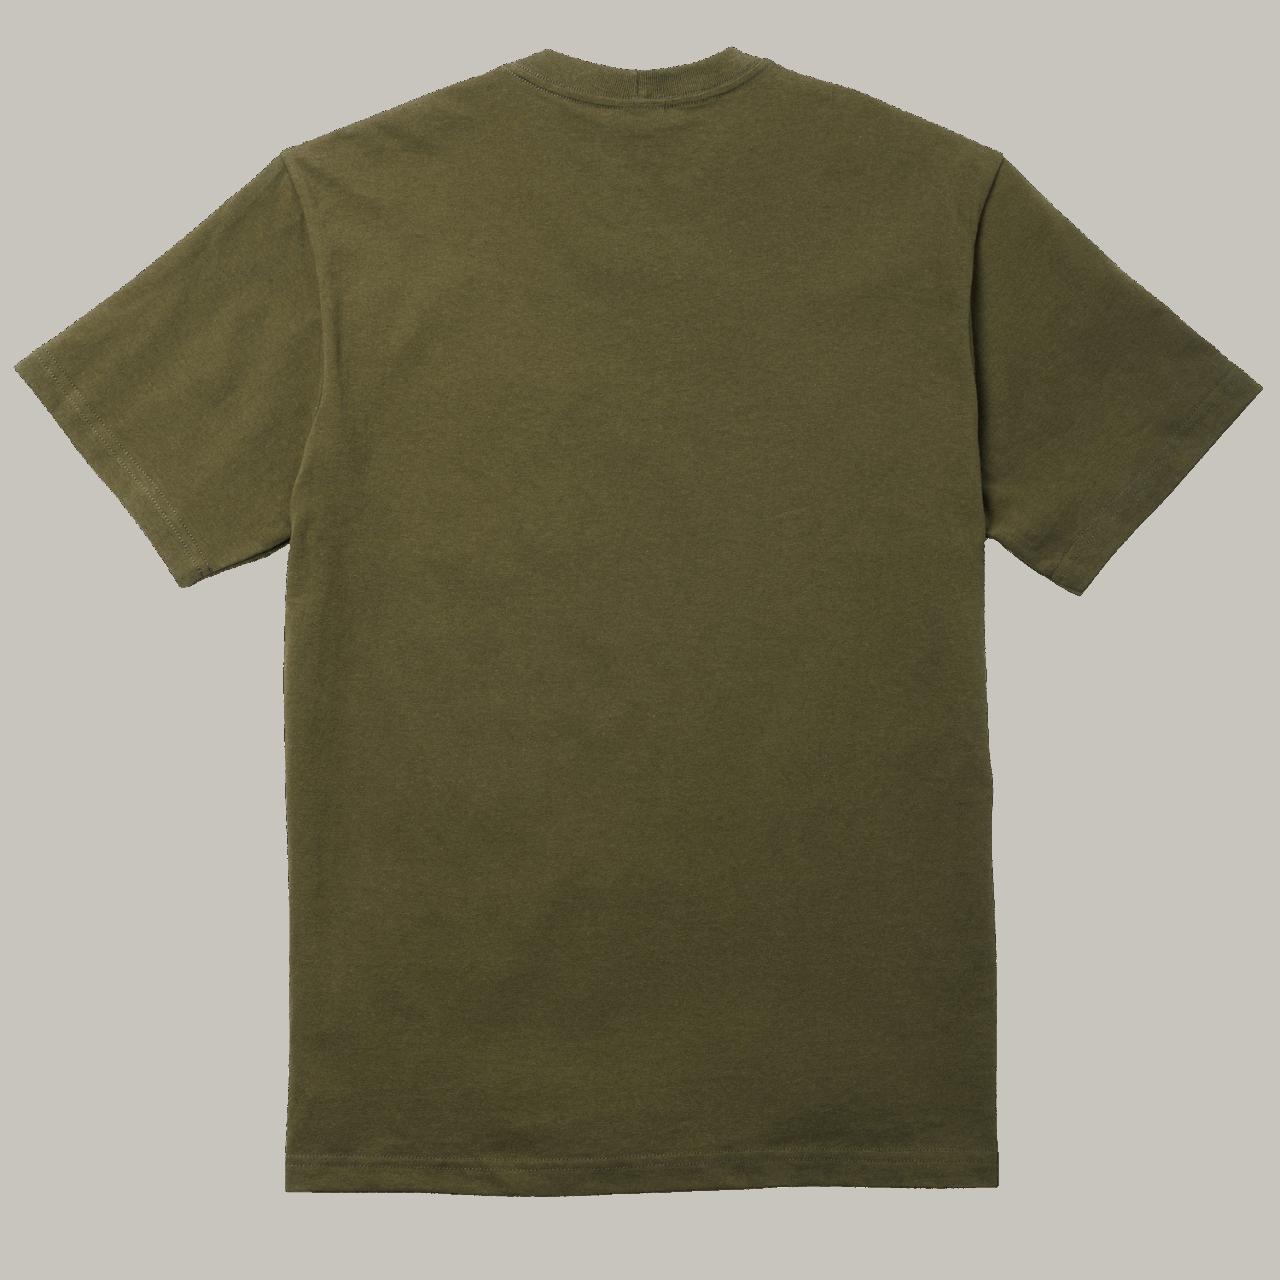 Filson Pioneer Solid One Pocket T-Shirt - olive